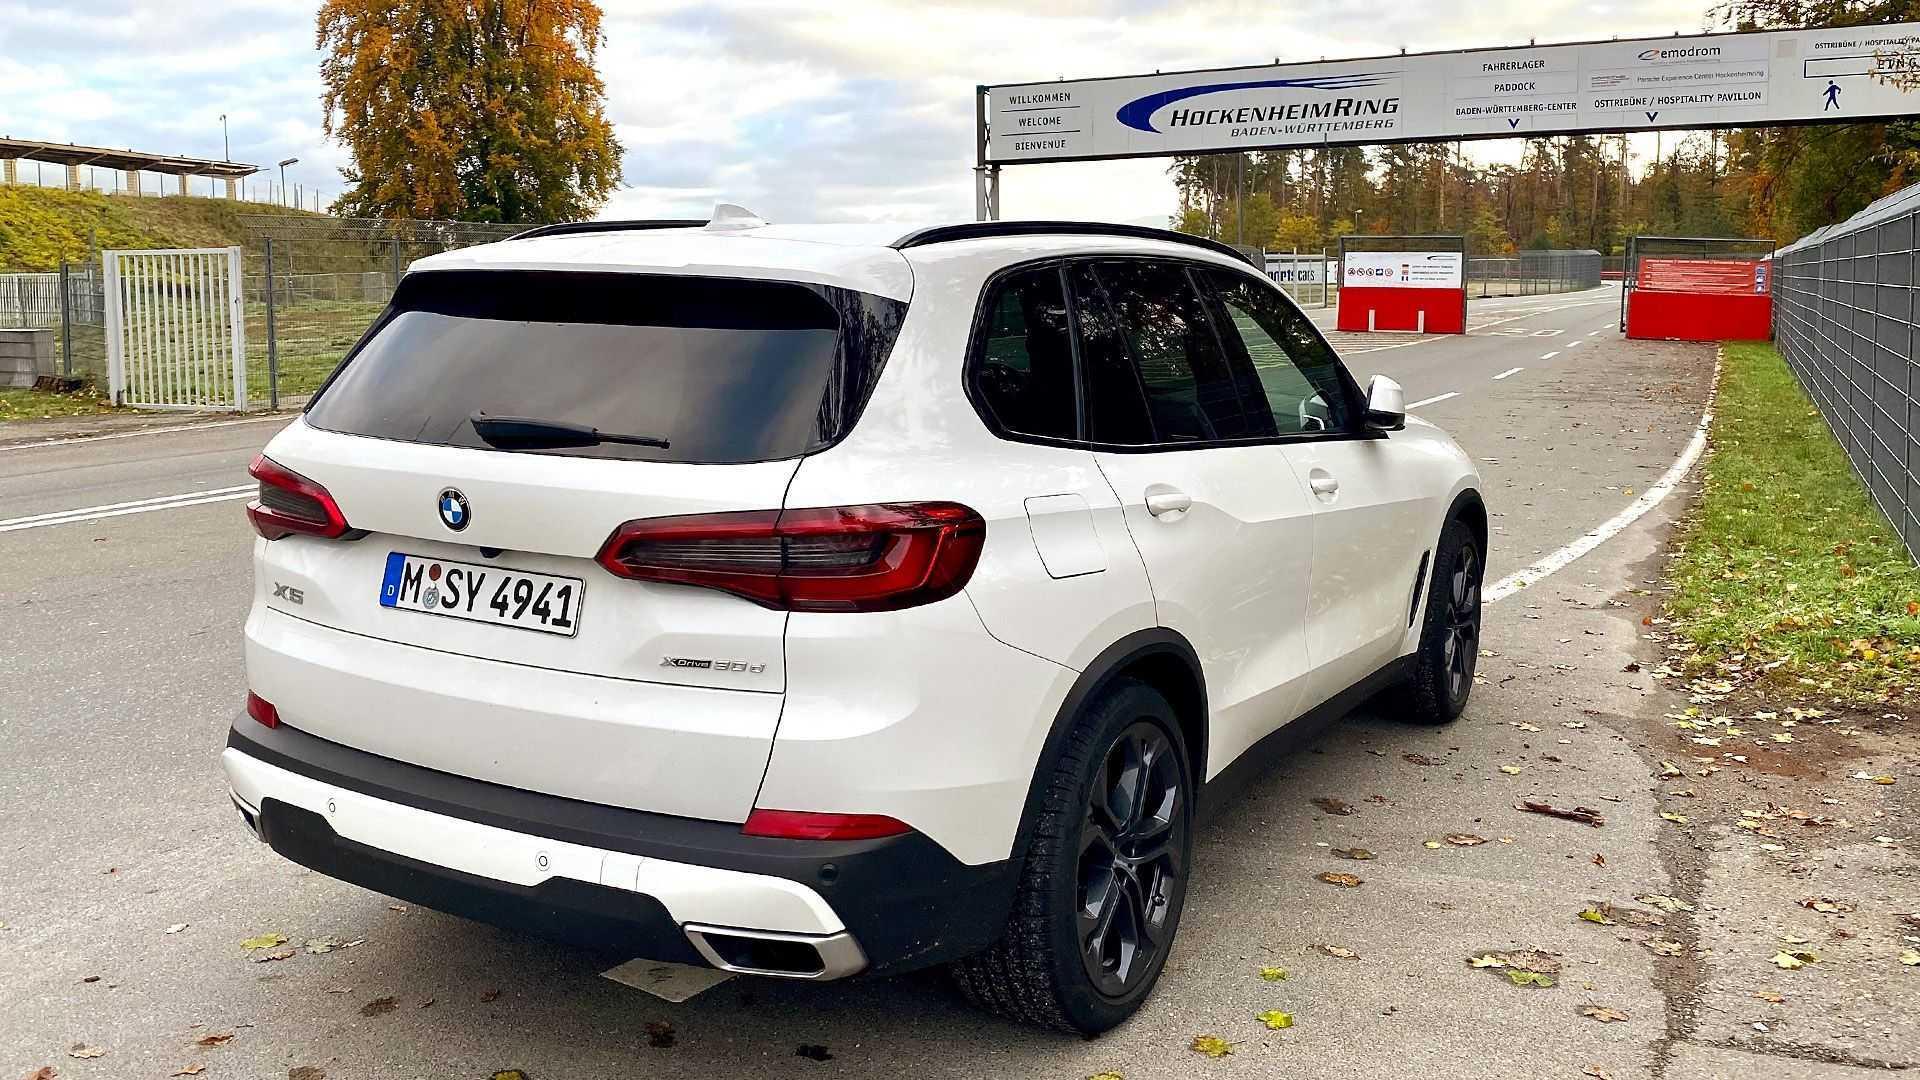 BMW X5 30d im Motor1-Dauertest - Teil 2